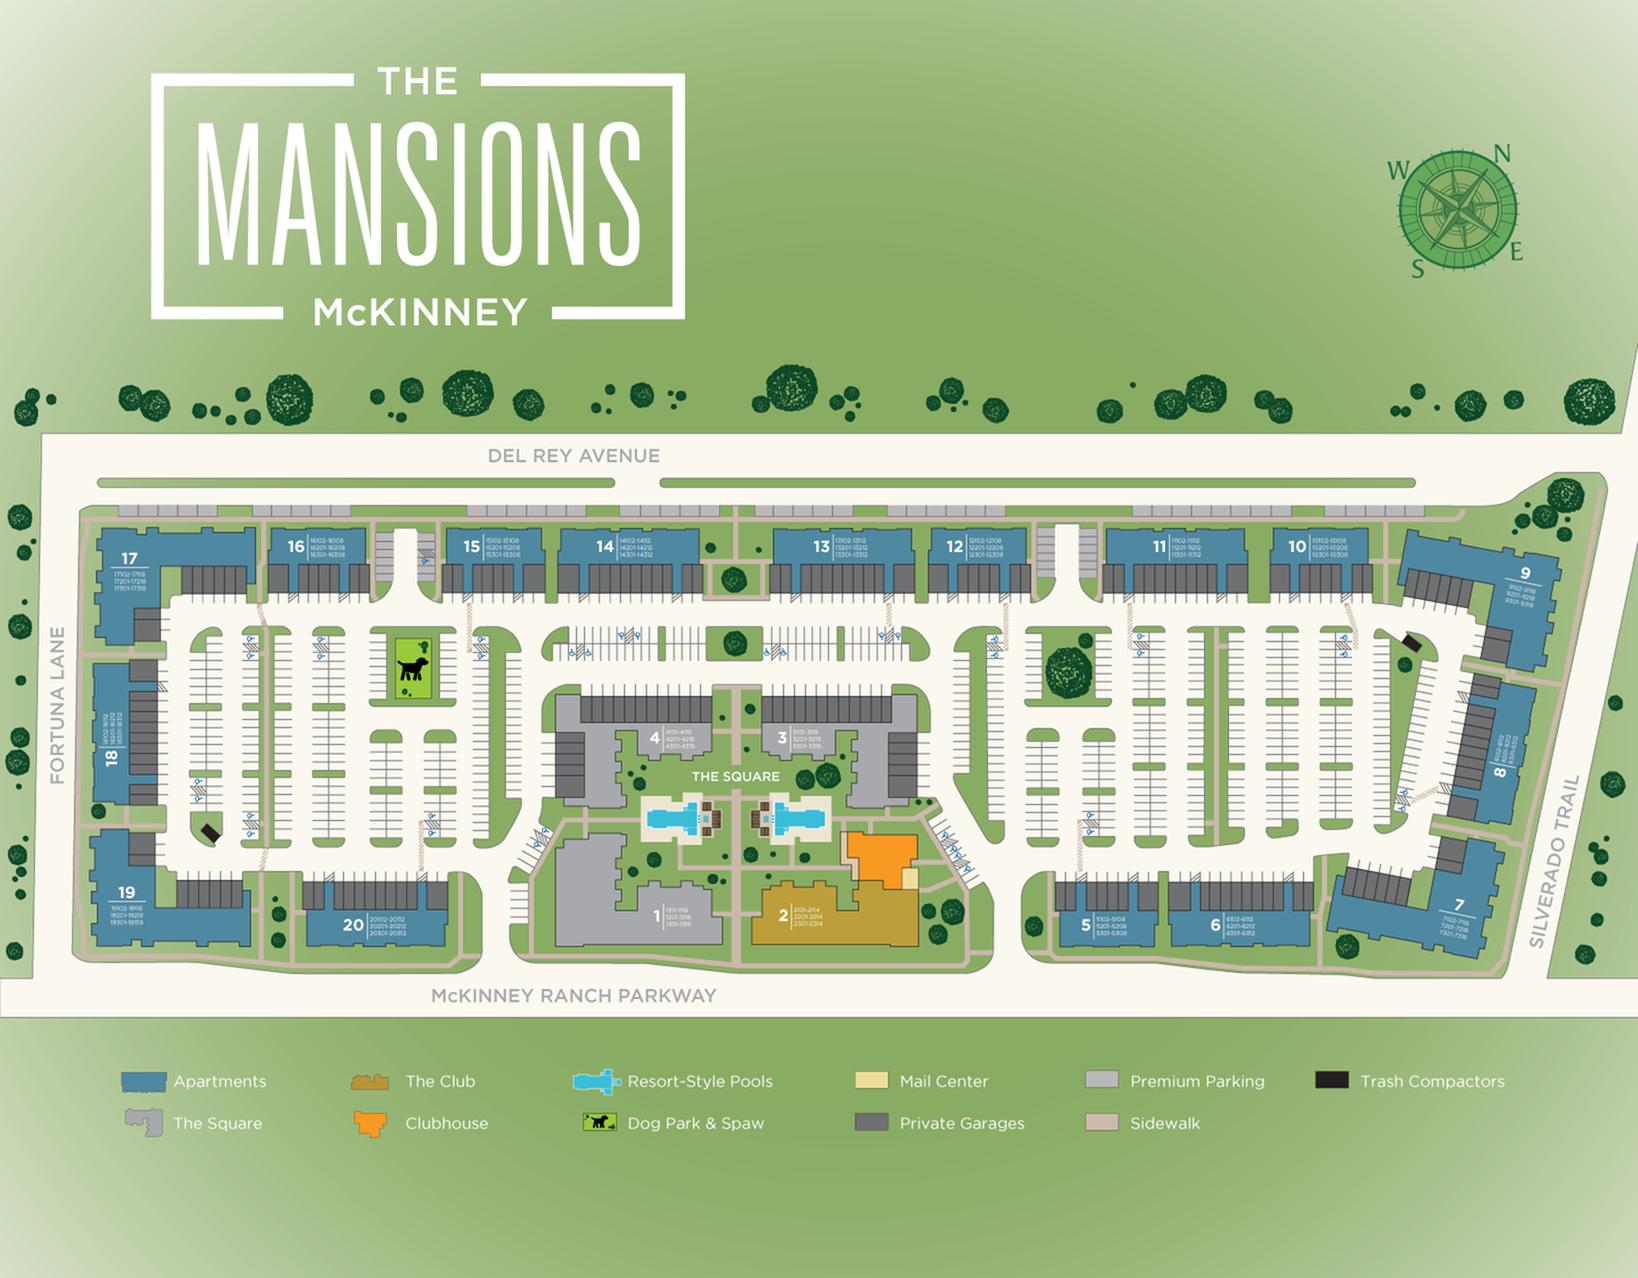 The Mansions McKinney image 62